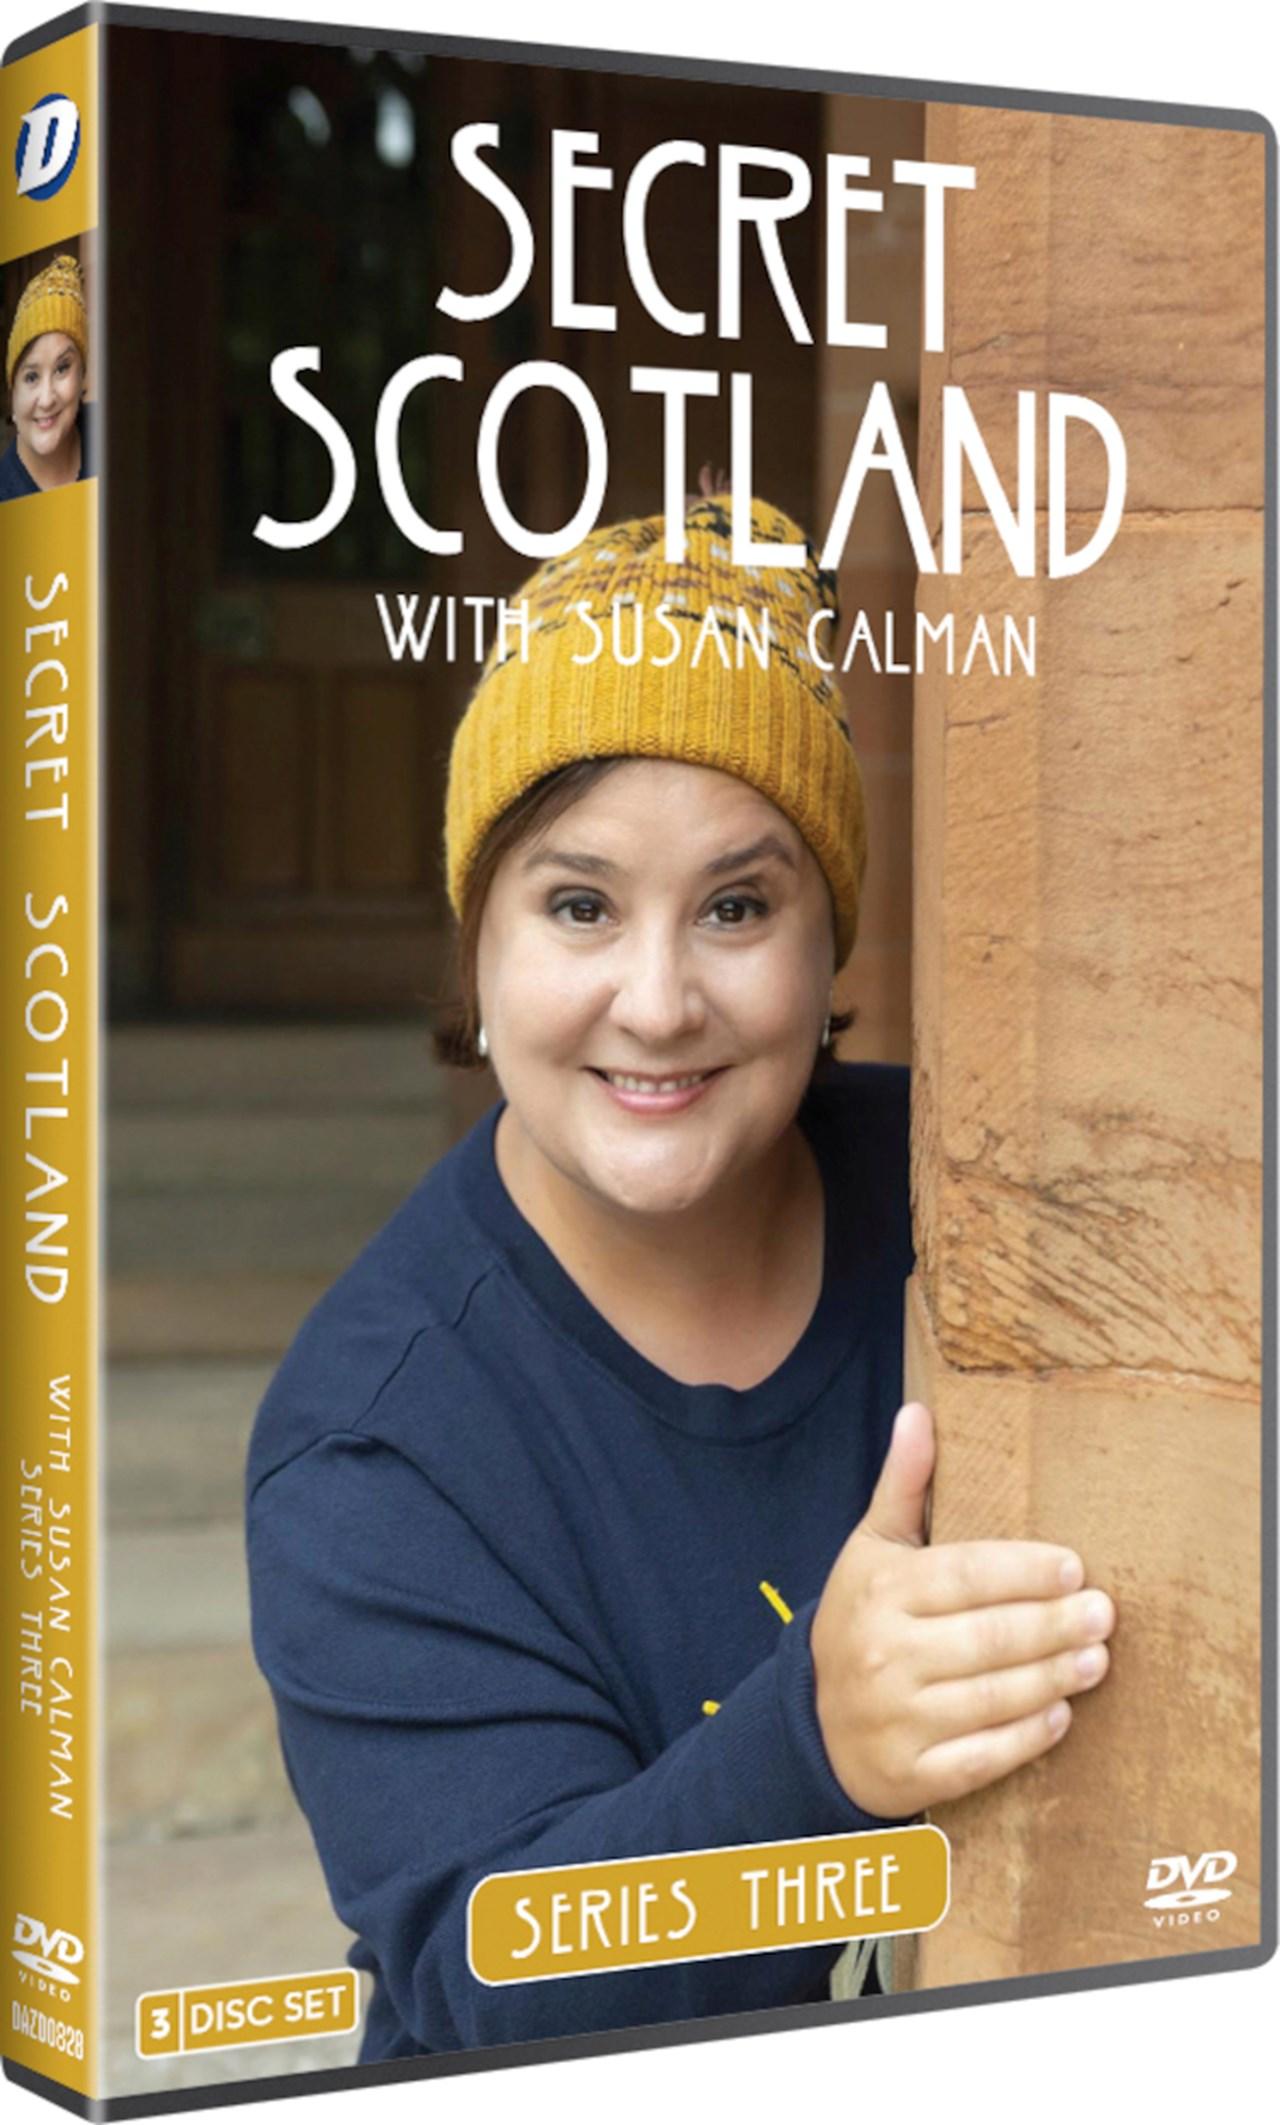 Secret Scotland With Susan Calman: Series Three - 2